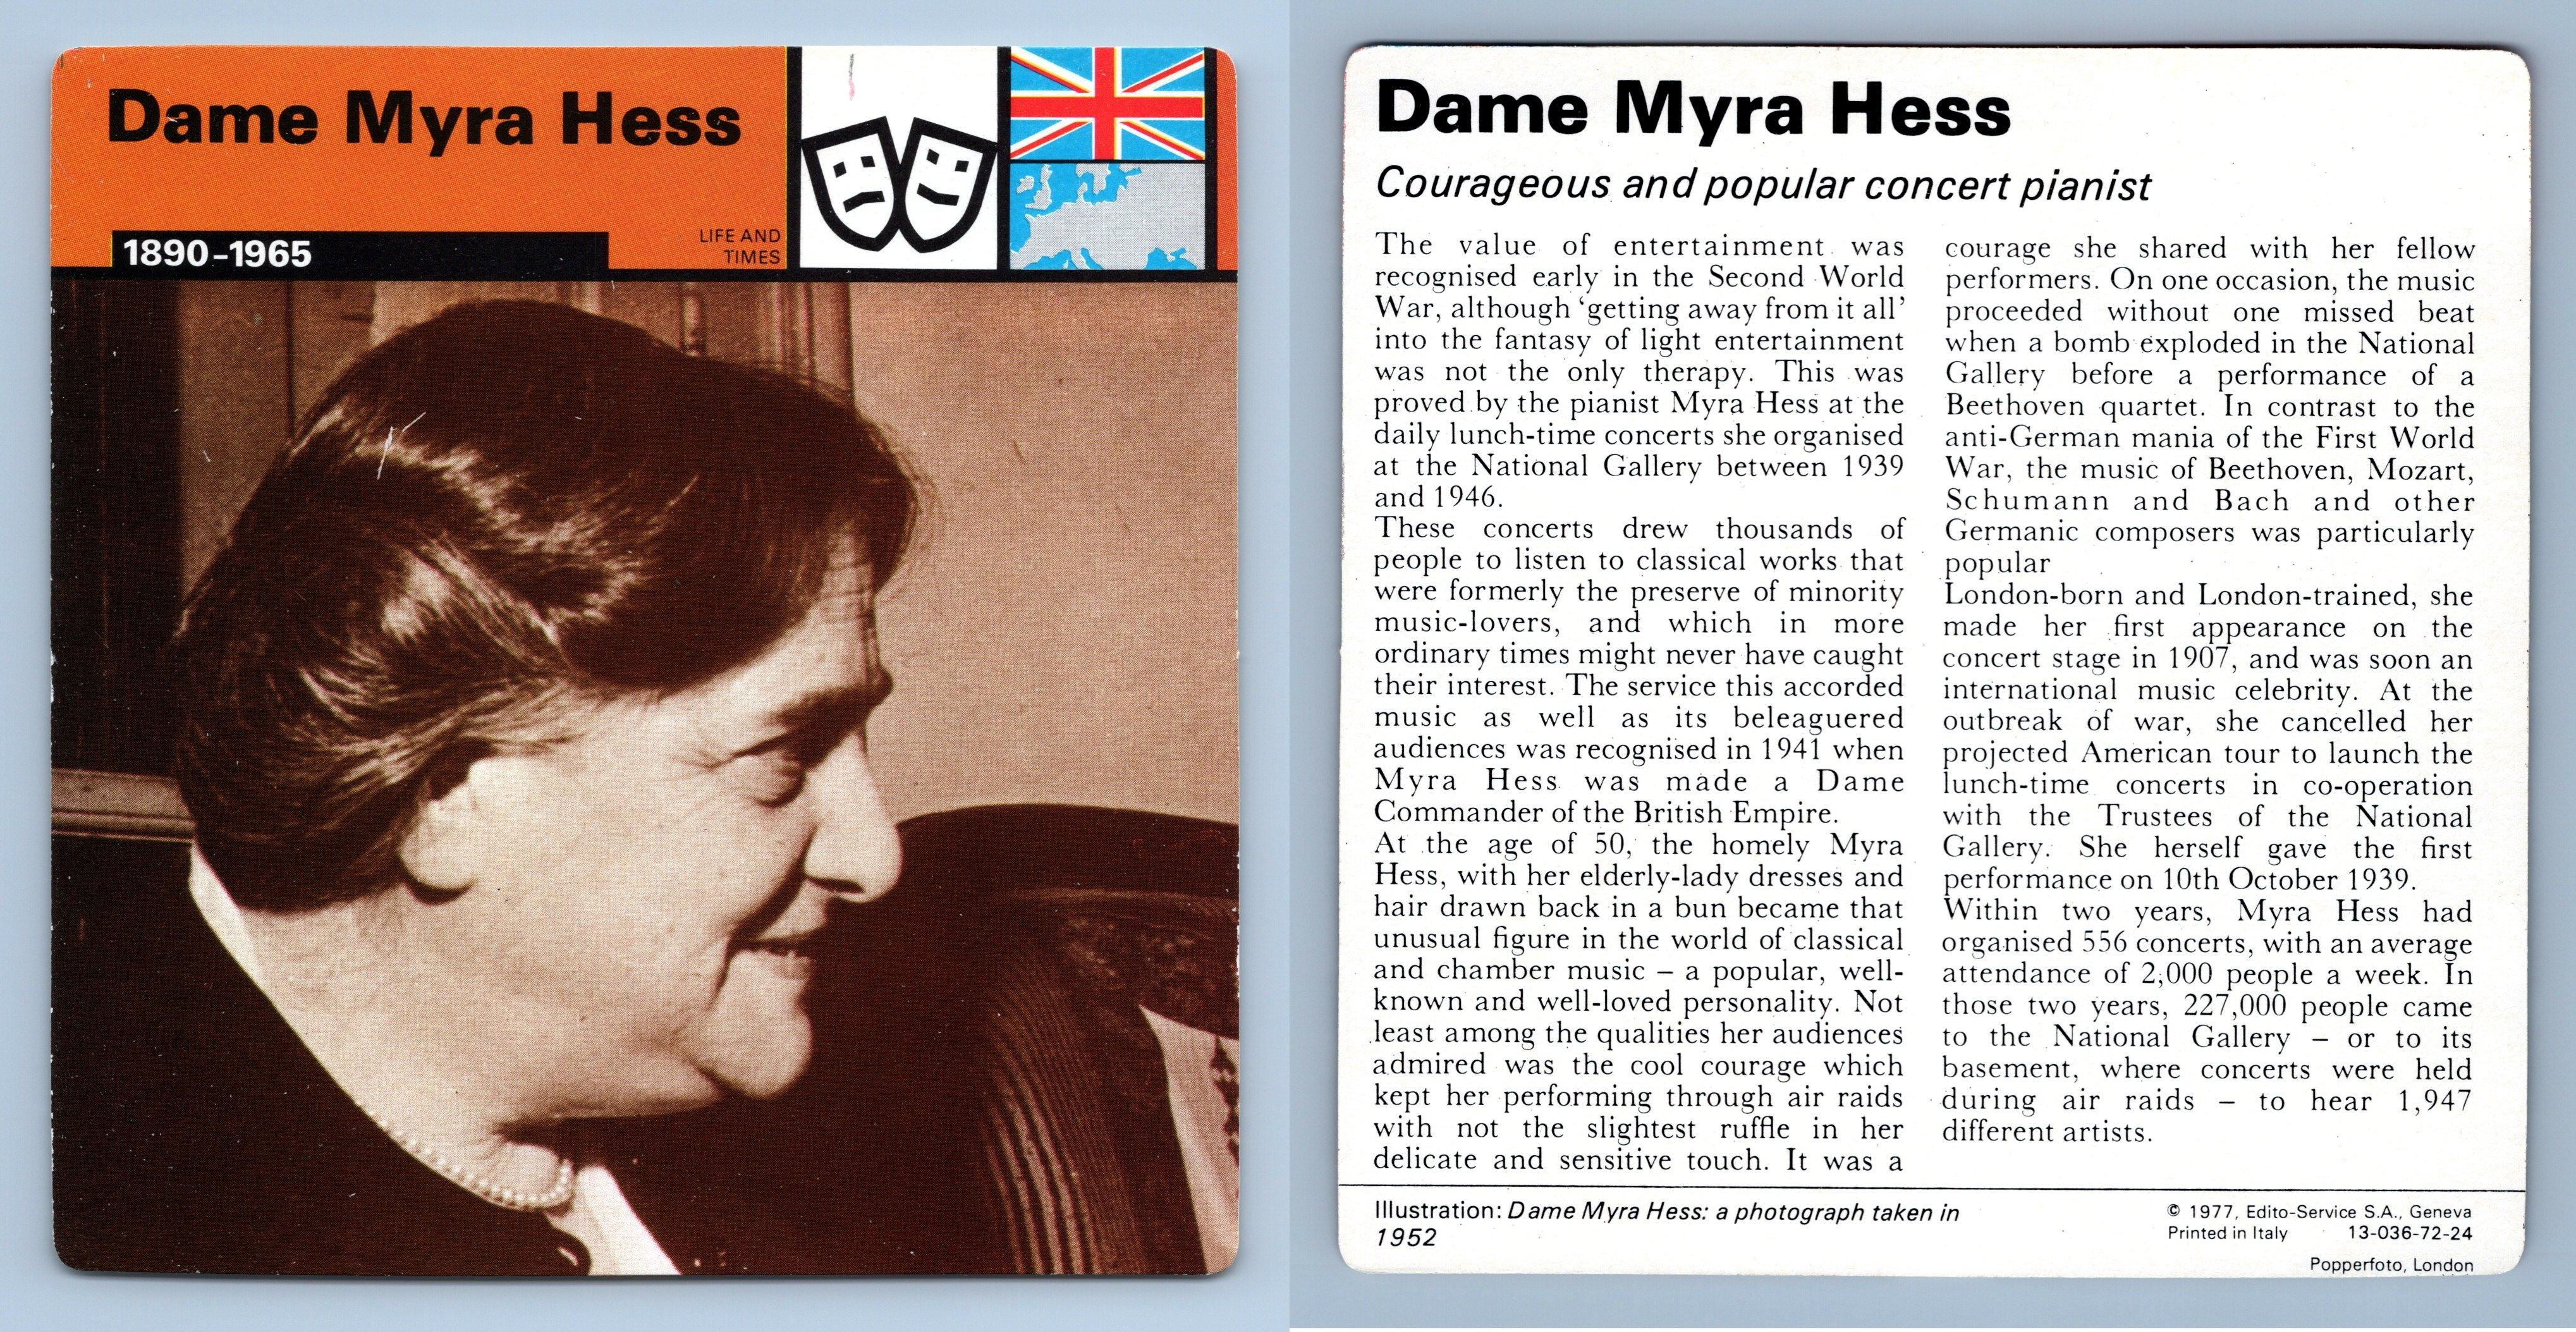 1923-41 WW2 Edito-Service SA 1977 Card SA Propaganda Life /& Times